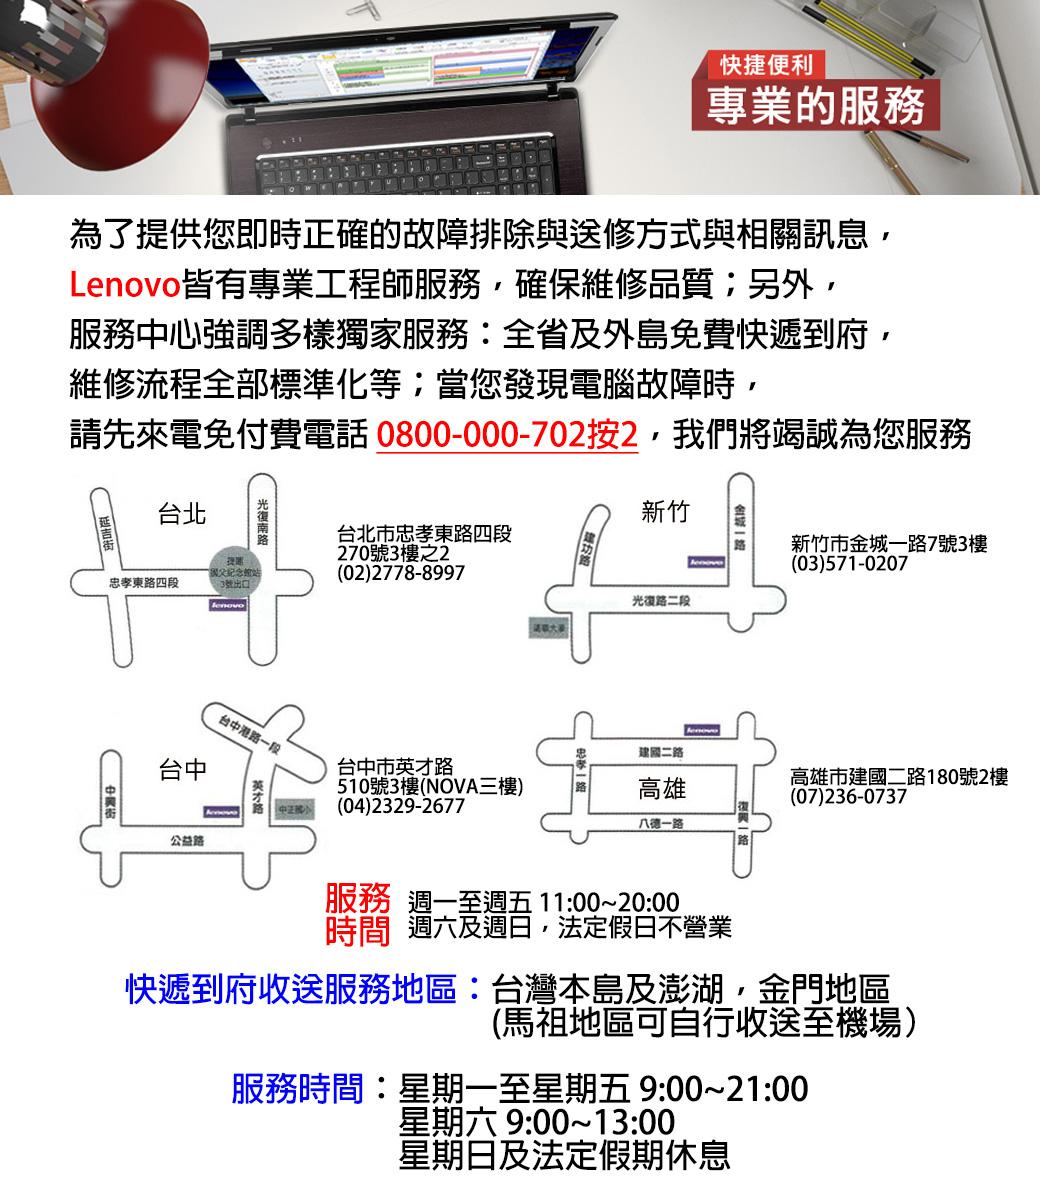 Lenovo warranty.jpg